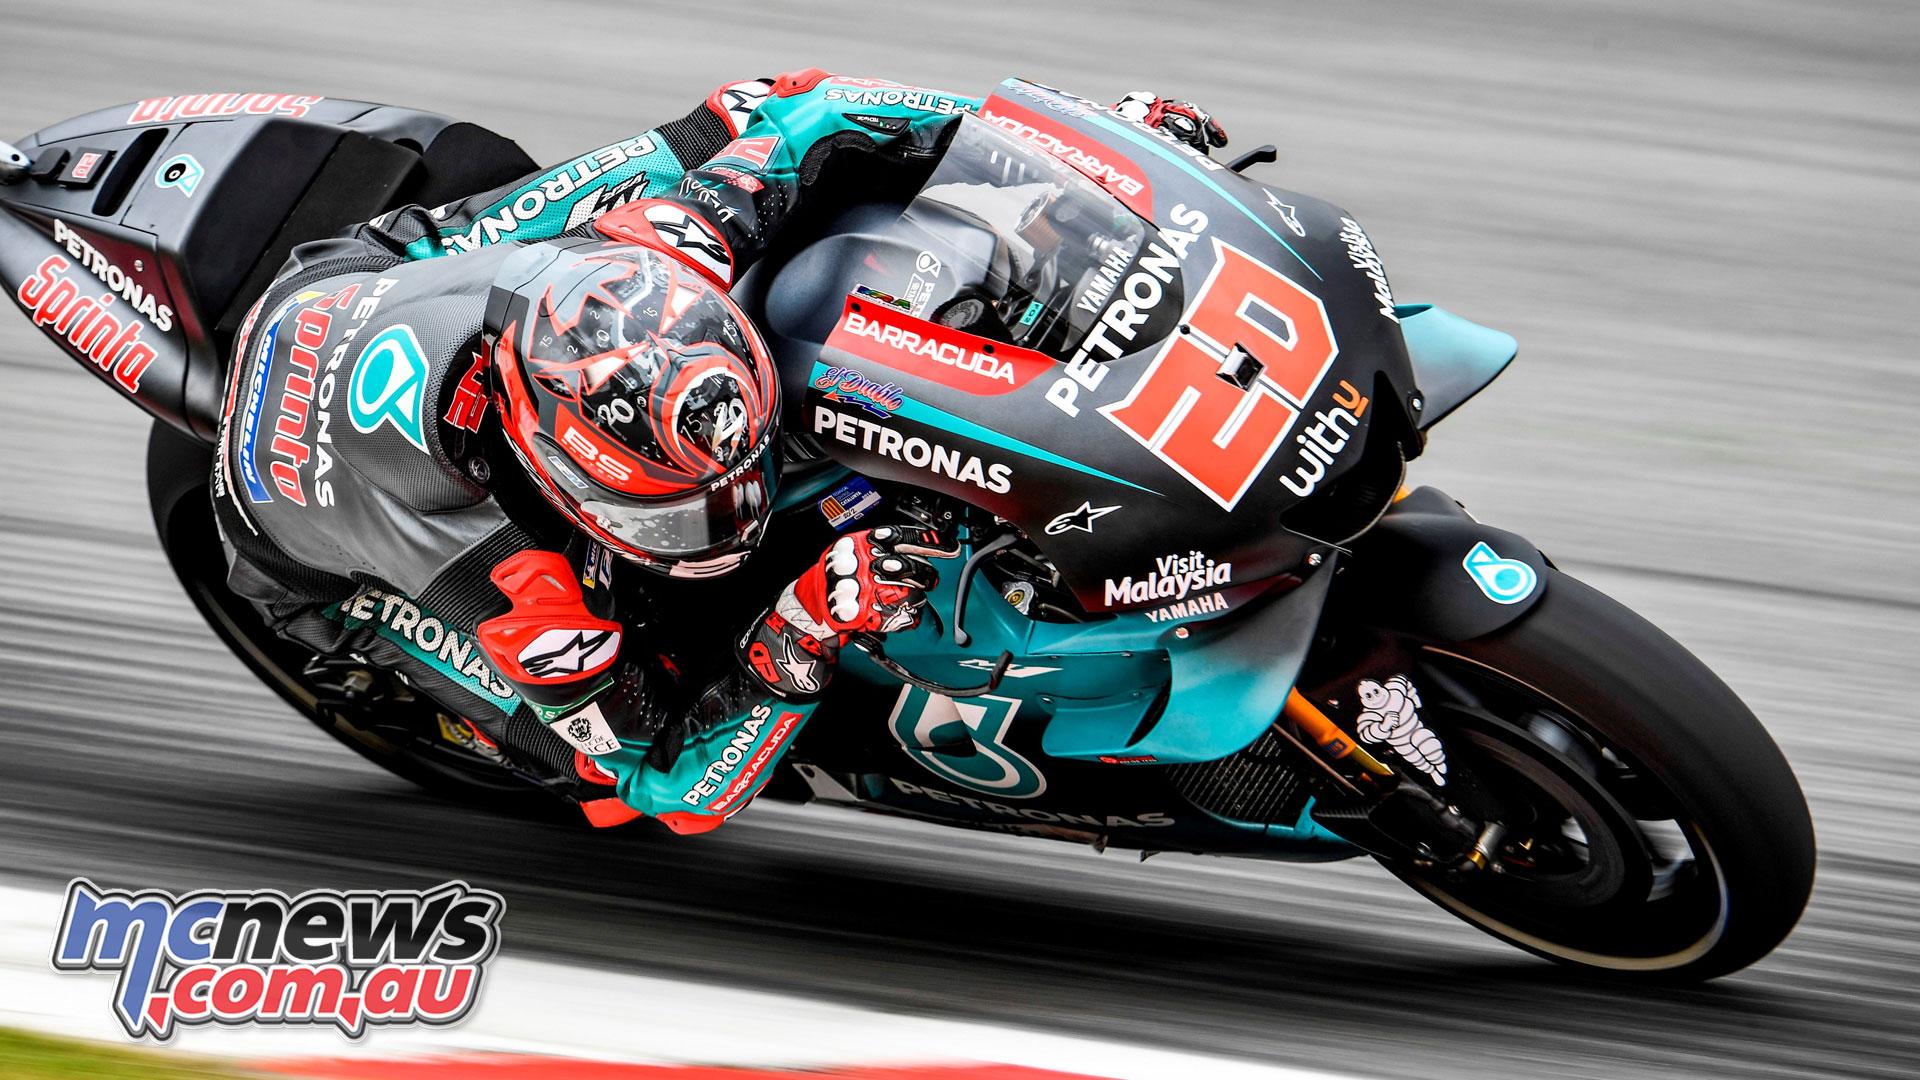 Fabio Quartararo fastest at Catalunya MotoGP Day 1 MCNewscomau 1920x1080